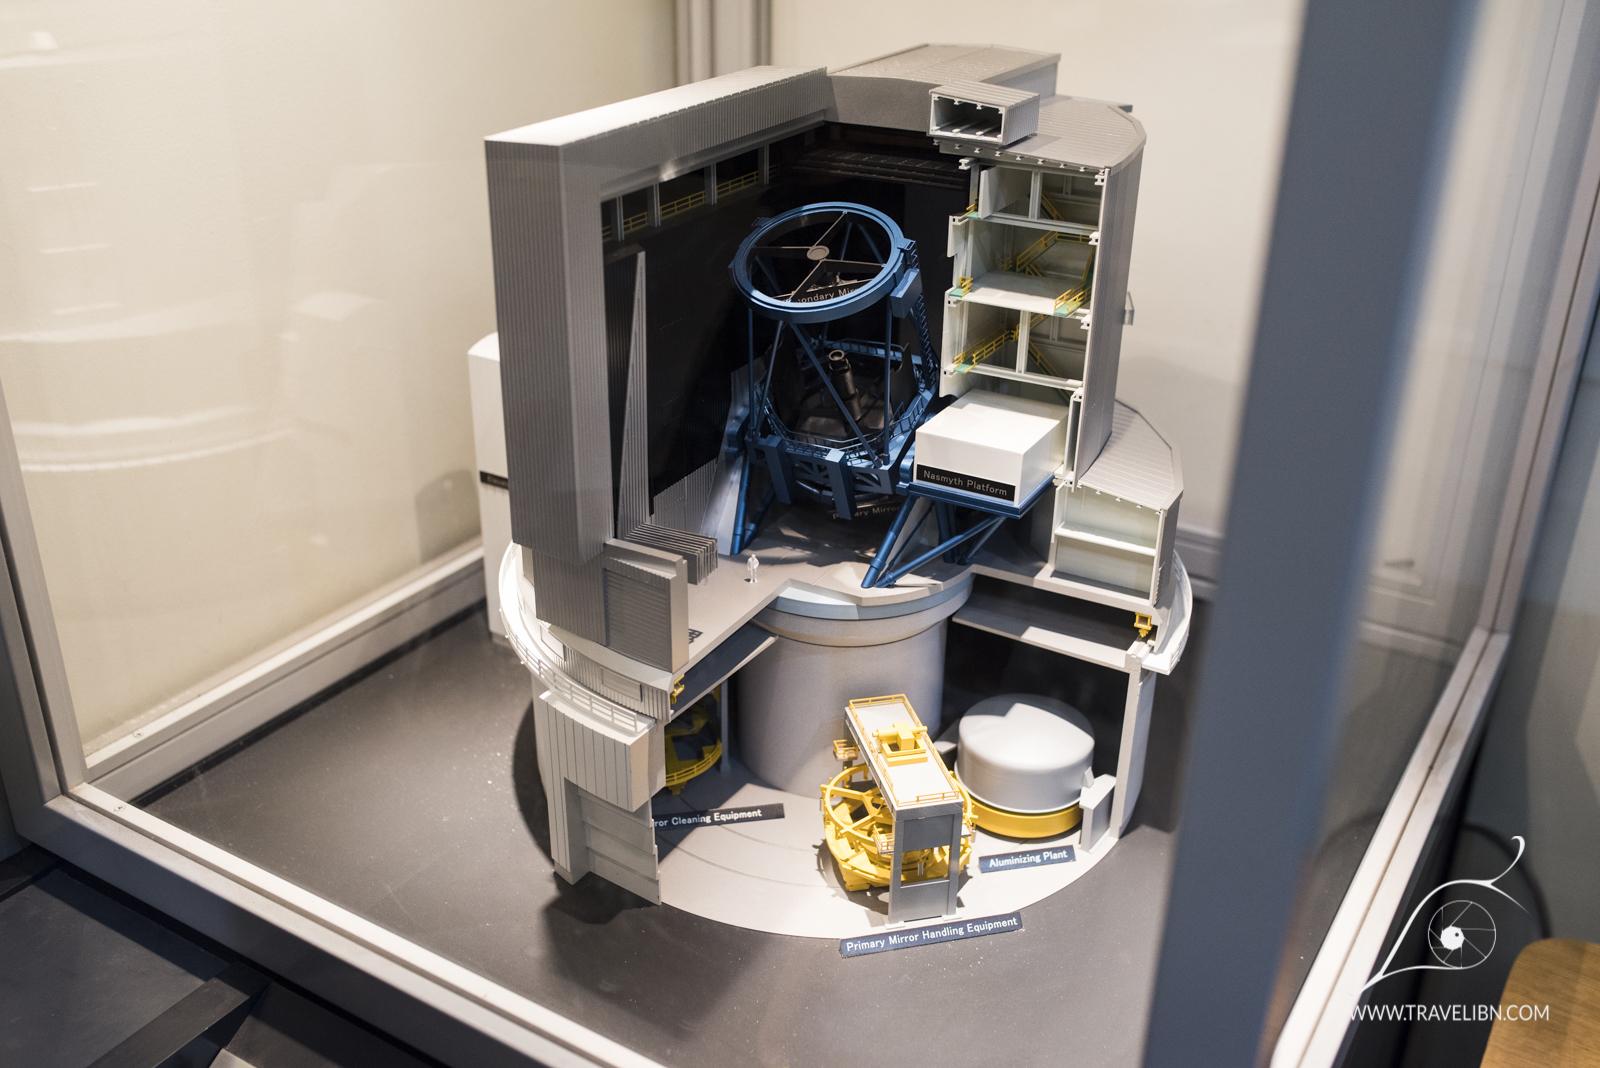 A model of the Subaru Telescope